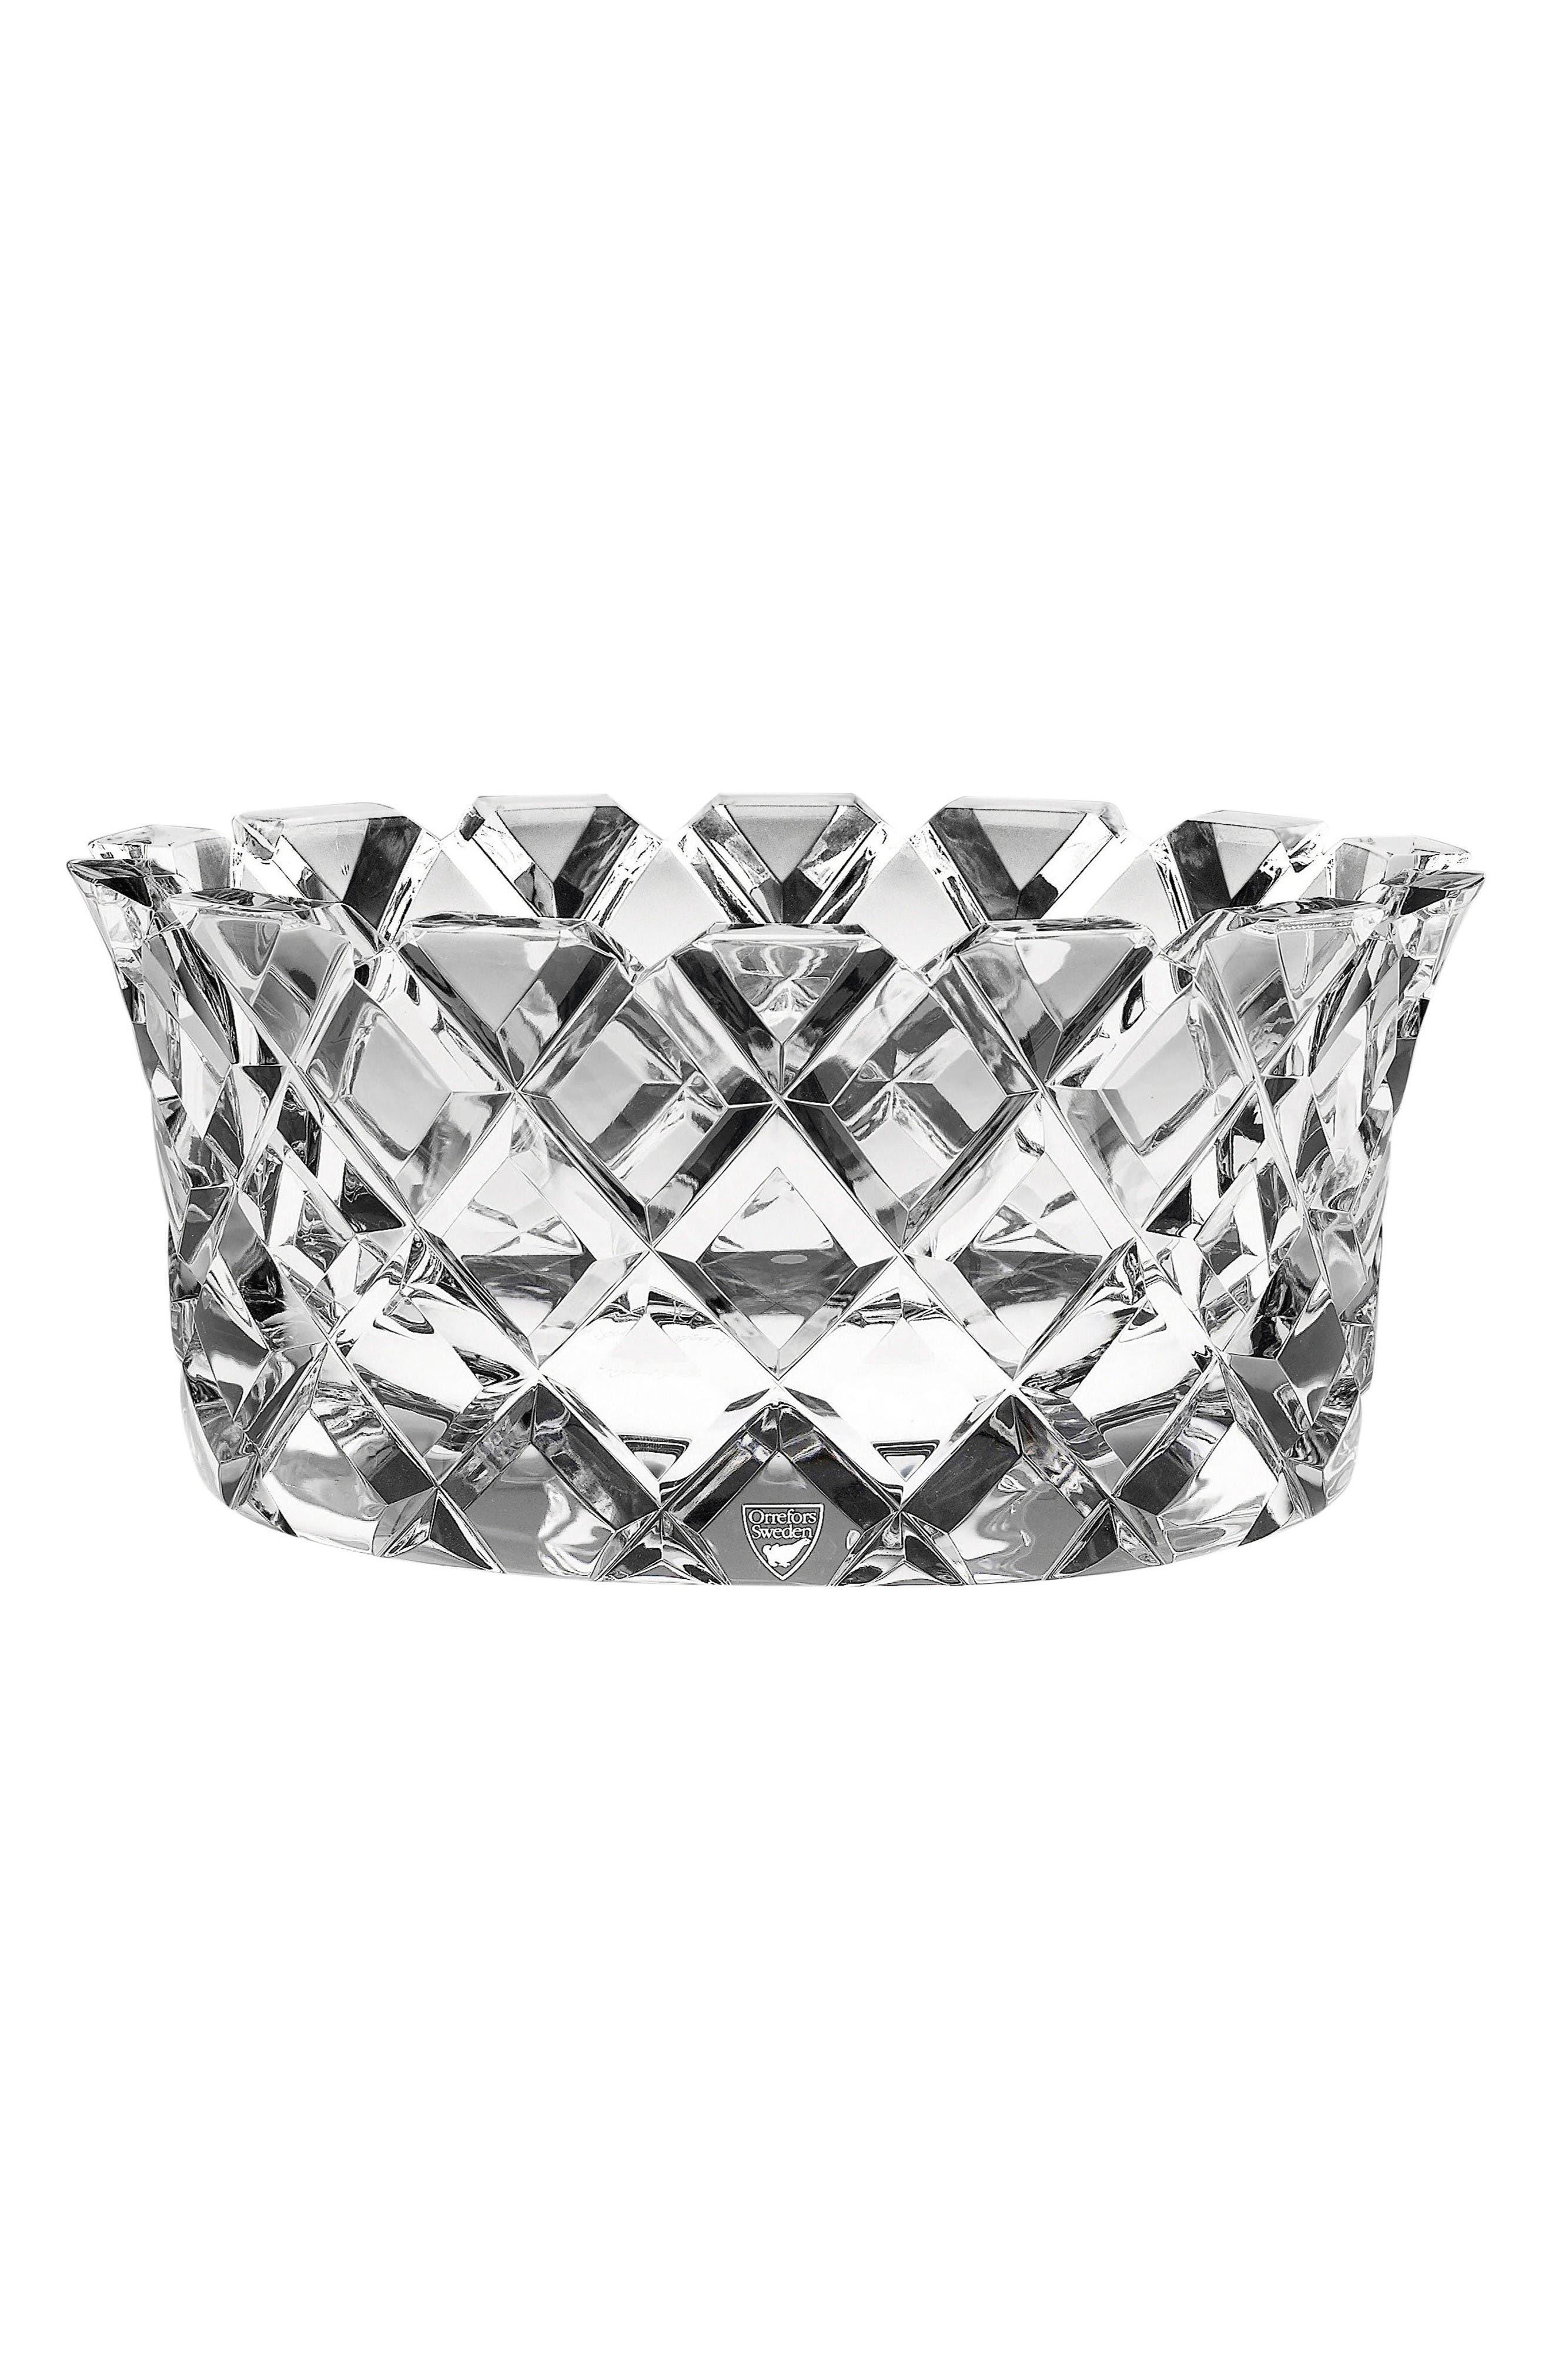 Main Image - Orrefors Sofiero Low Crystal Bowl